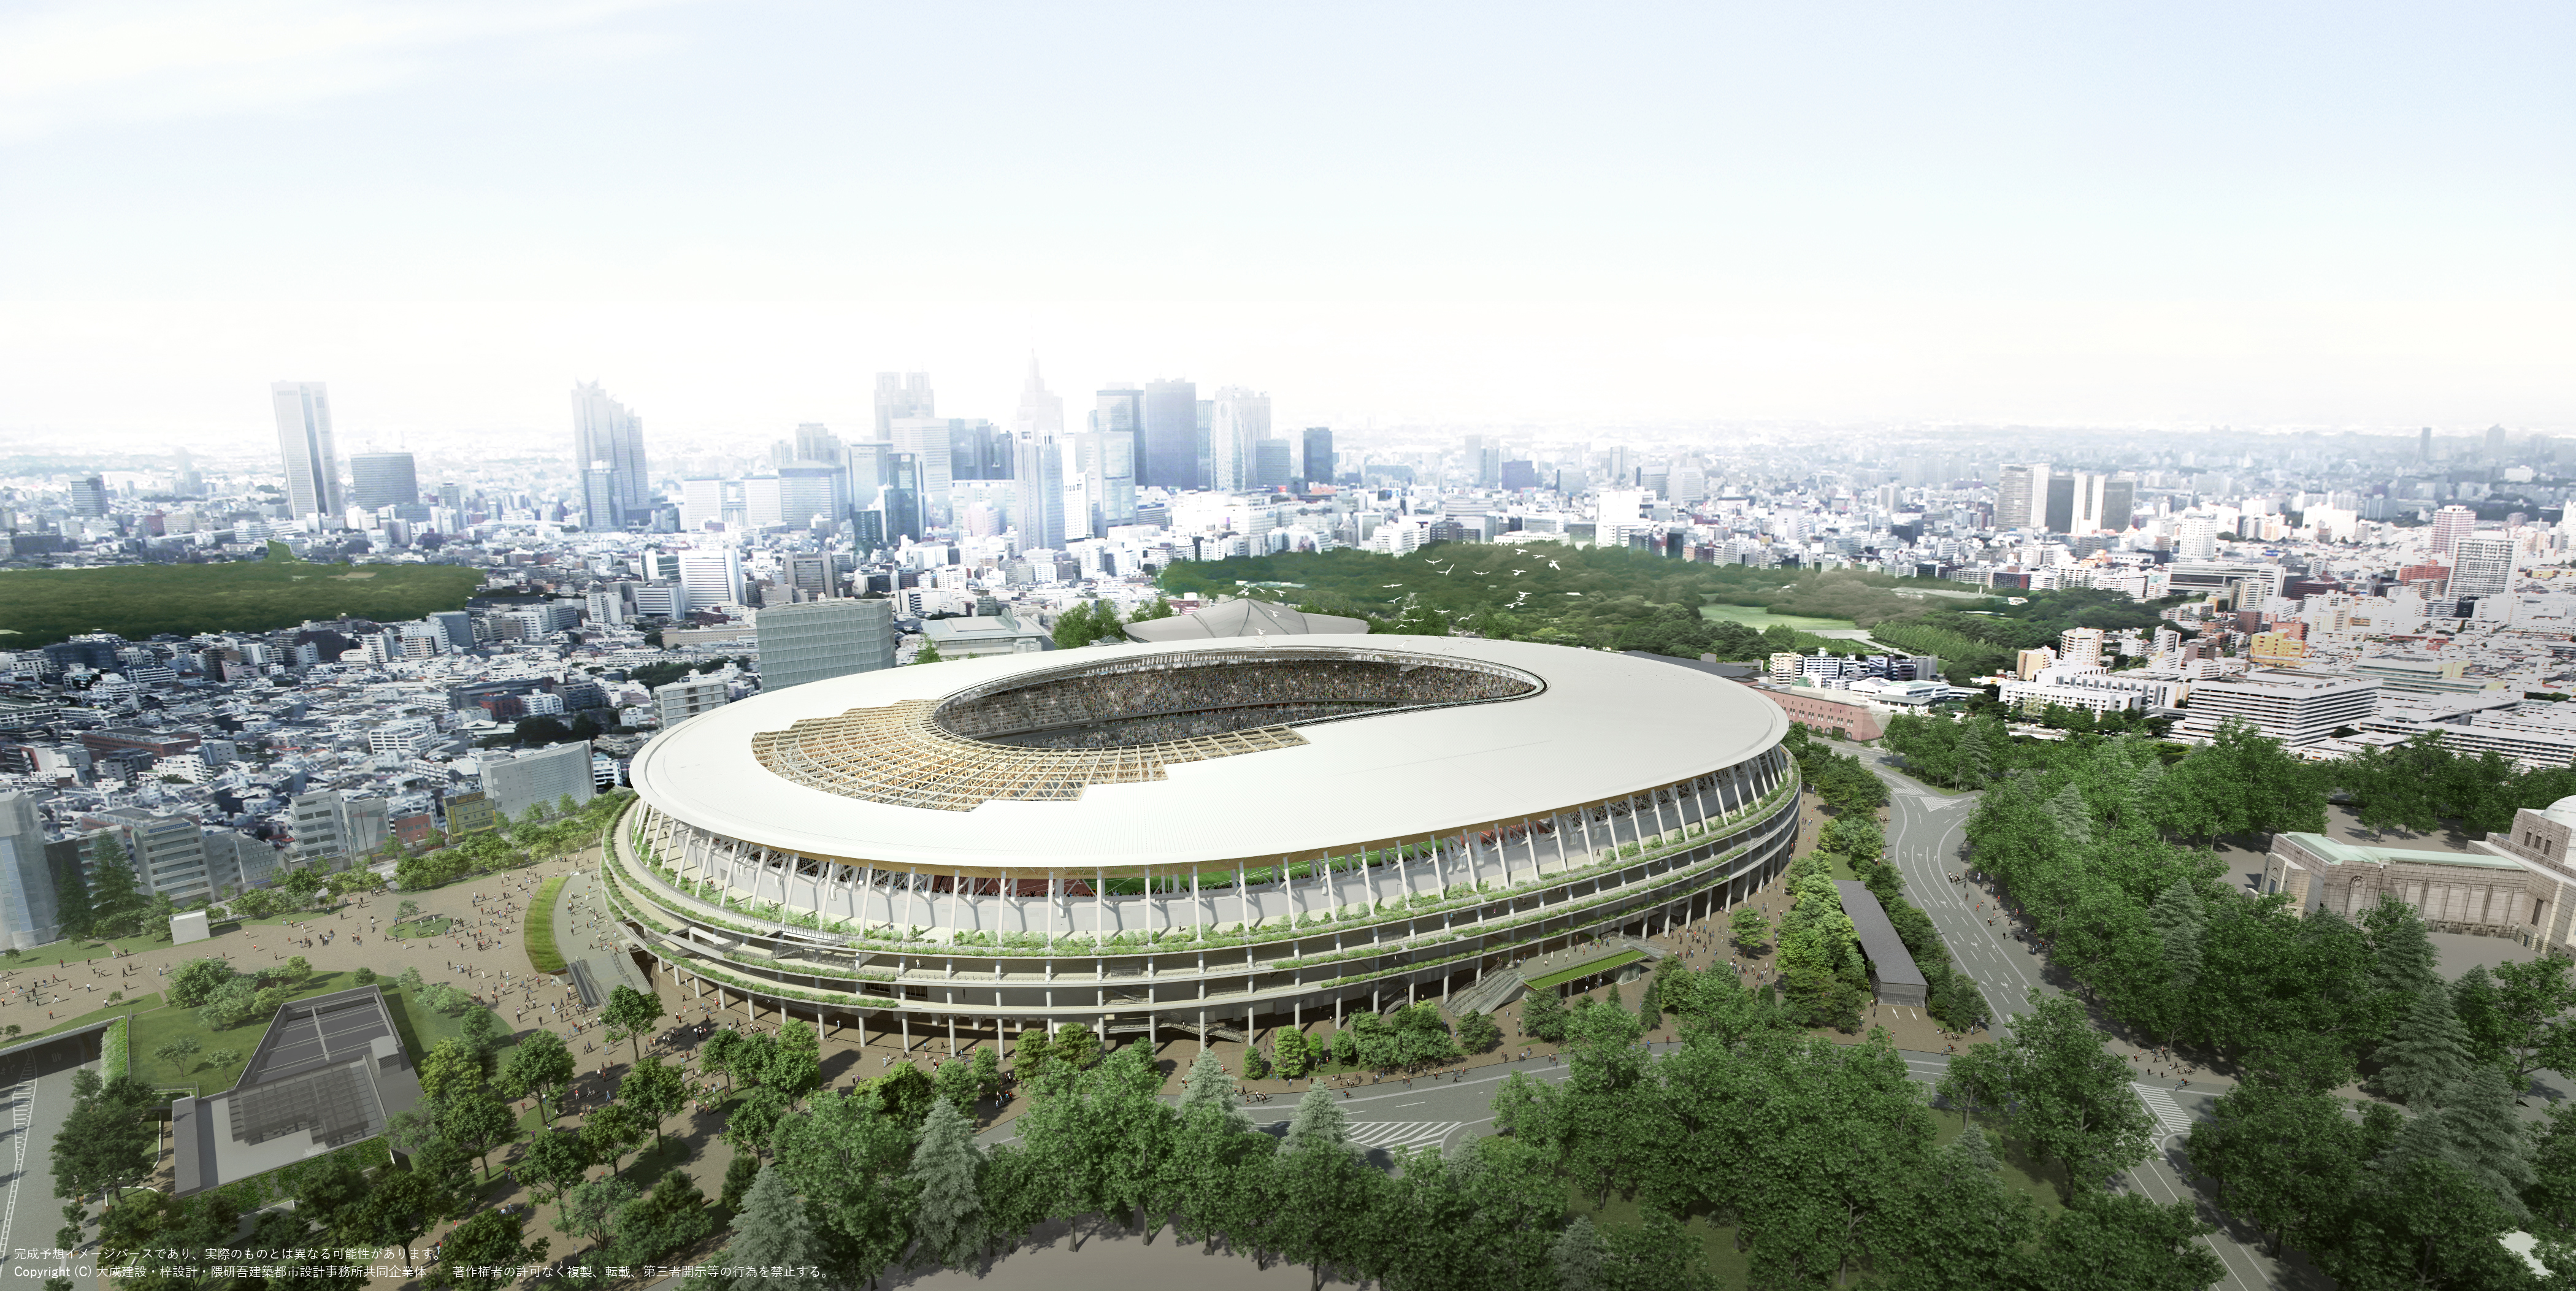 Stadio olimpico tokyo 2020